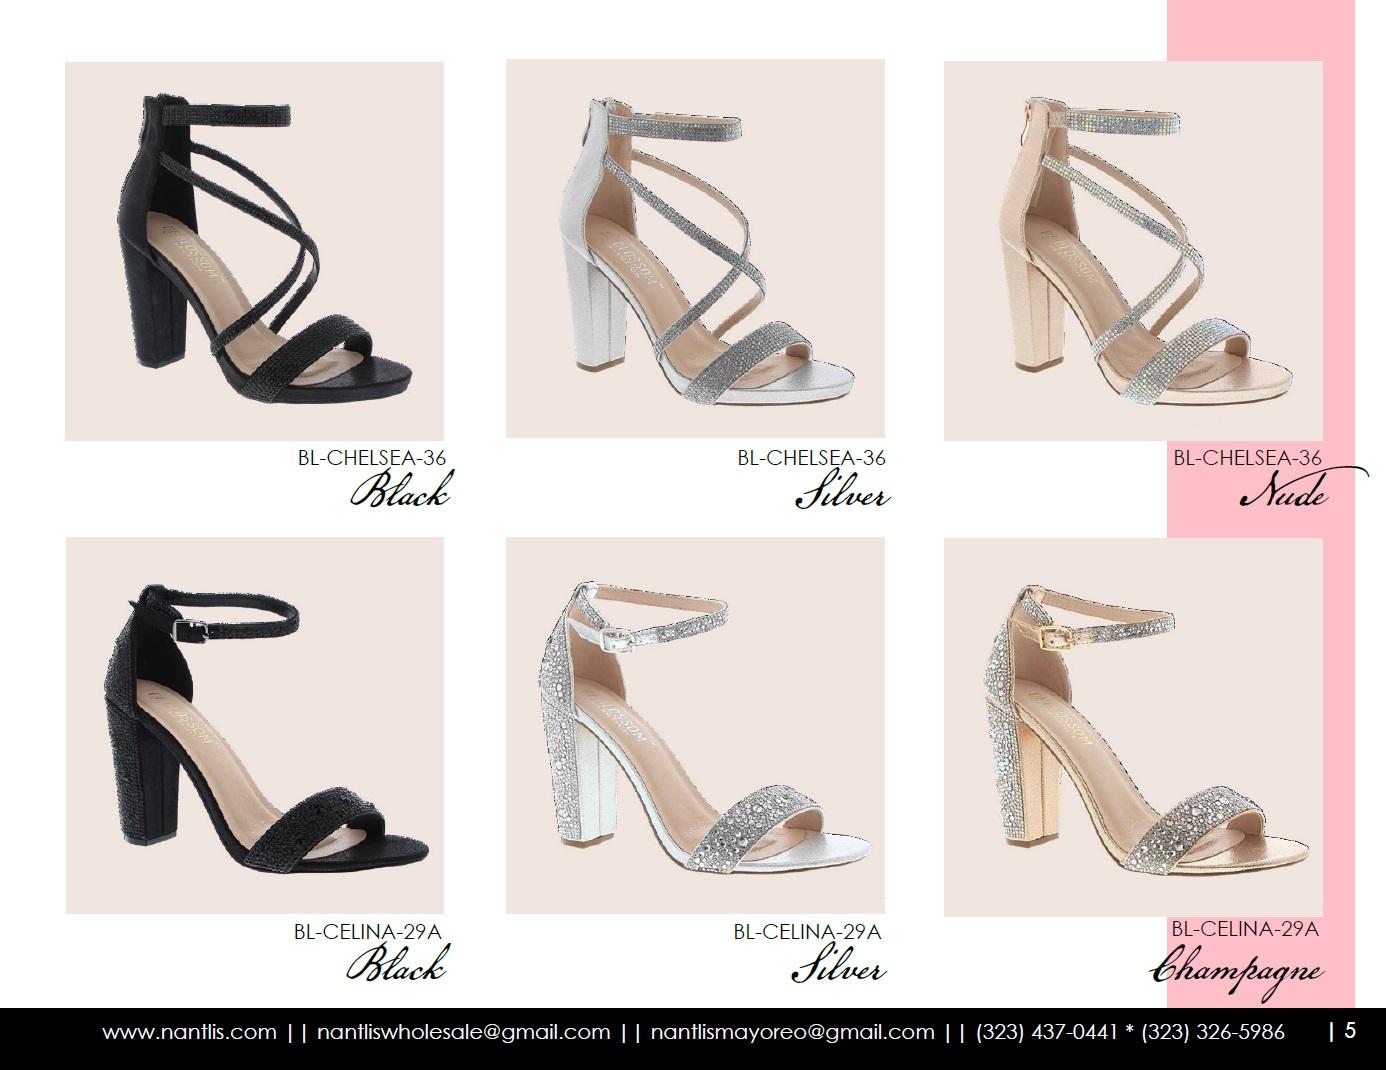 Nantlis Vol BL50 Zapatos de Mujer mayoreo Catalogo Wholesale womens Shoes_Page_05